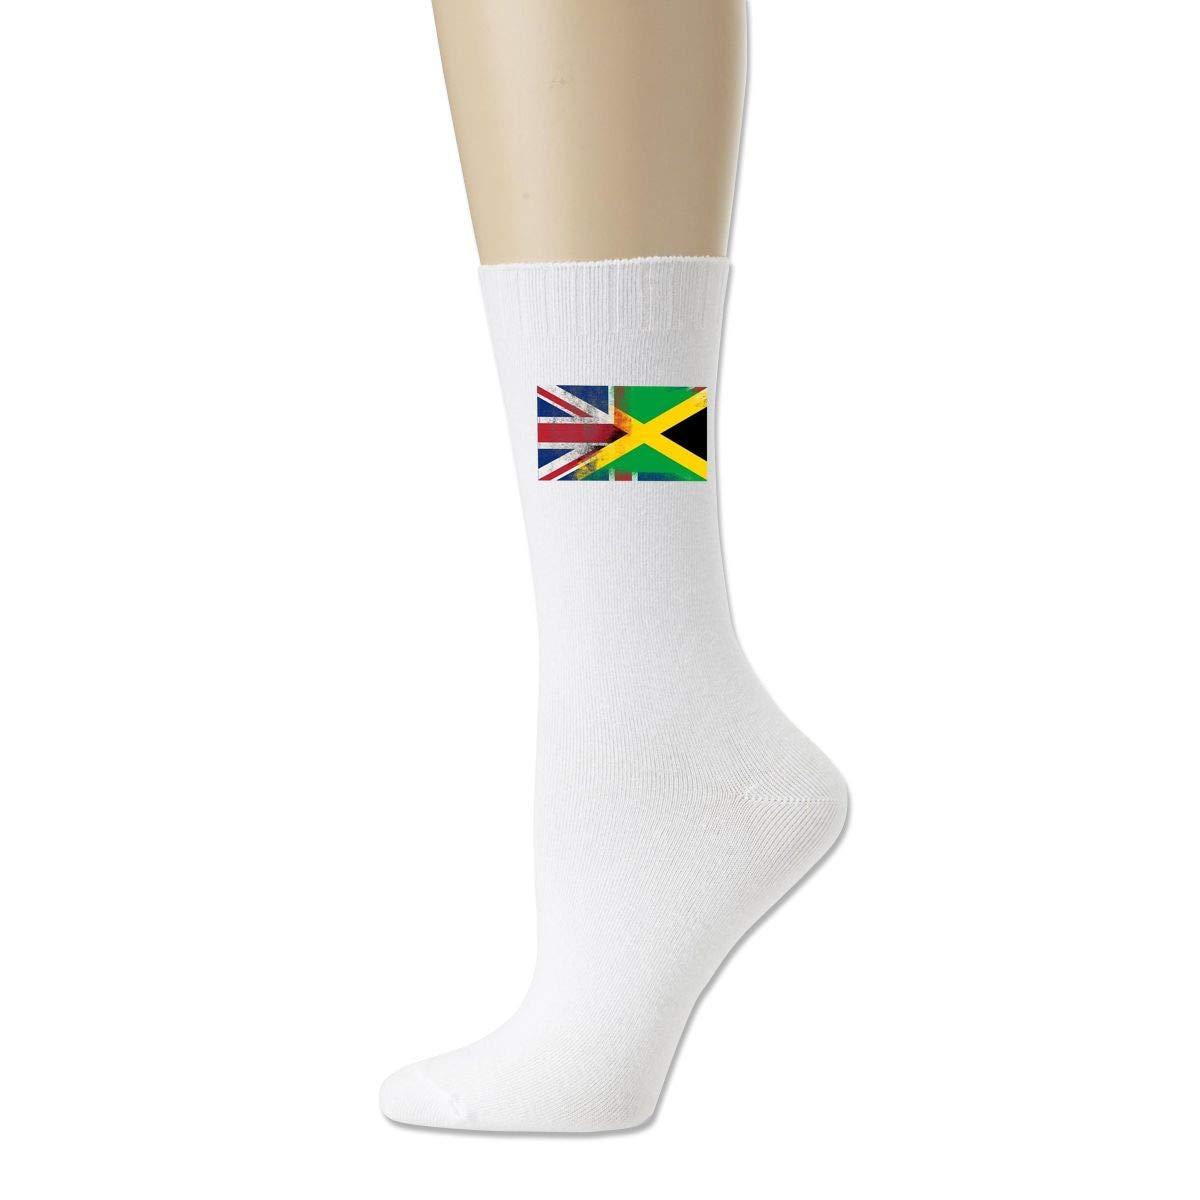 Men Women British Jamaican Half Jamaica Half UK Flag Running Cotton Crew Socks Athletic Sock